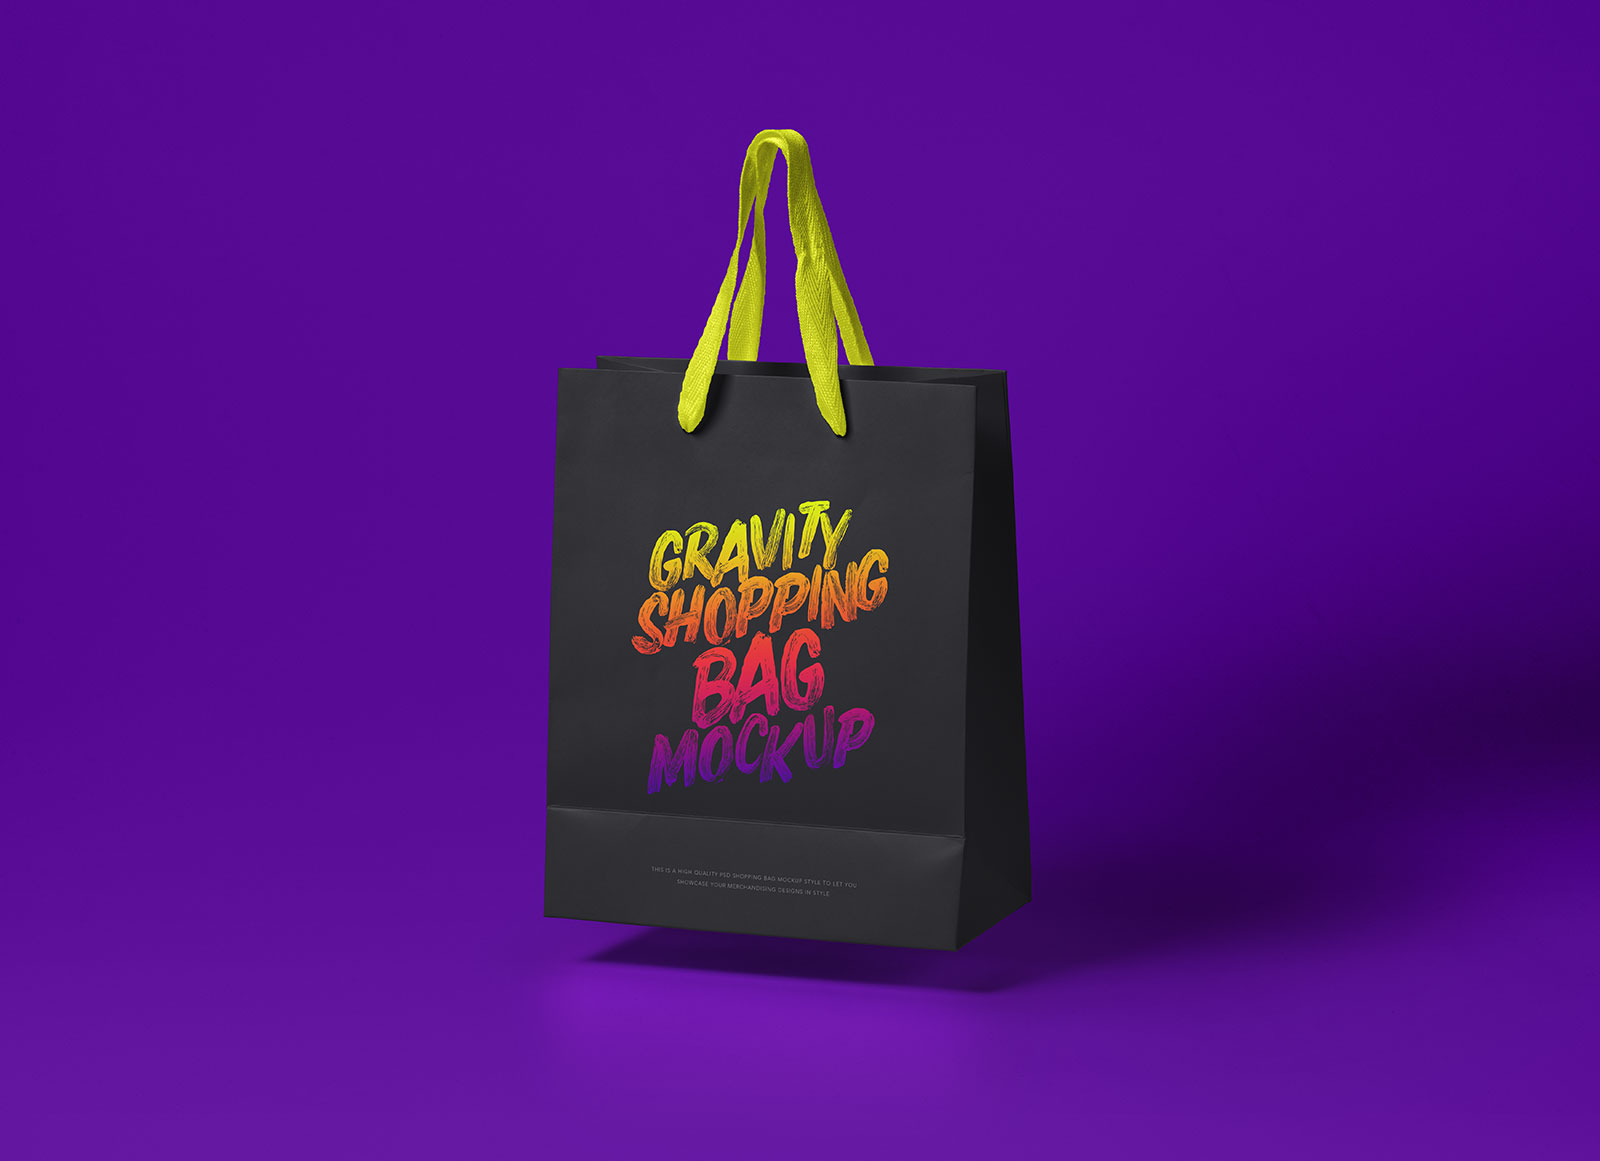 Free-Black-&-White-Floating-Shopping-Bag-Mockup-PSD